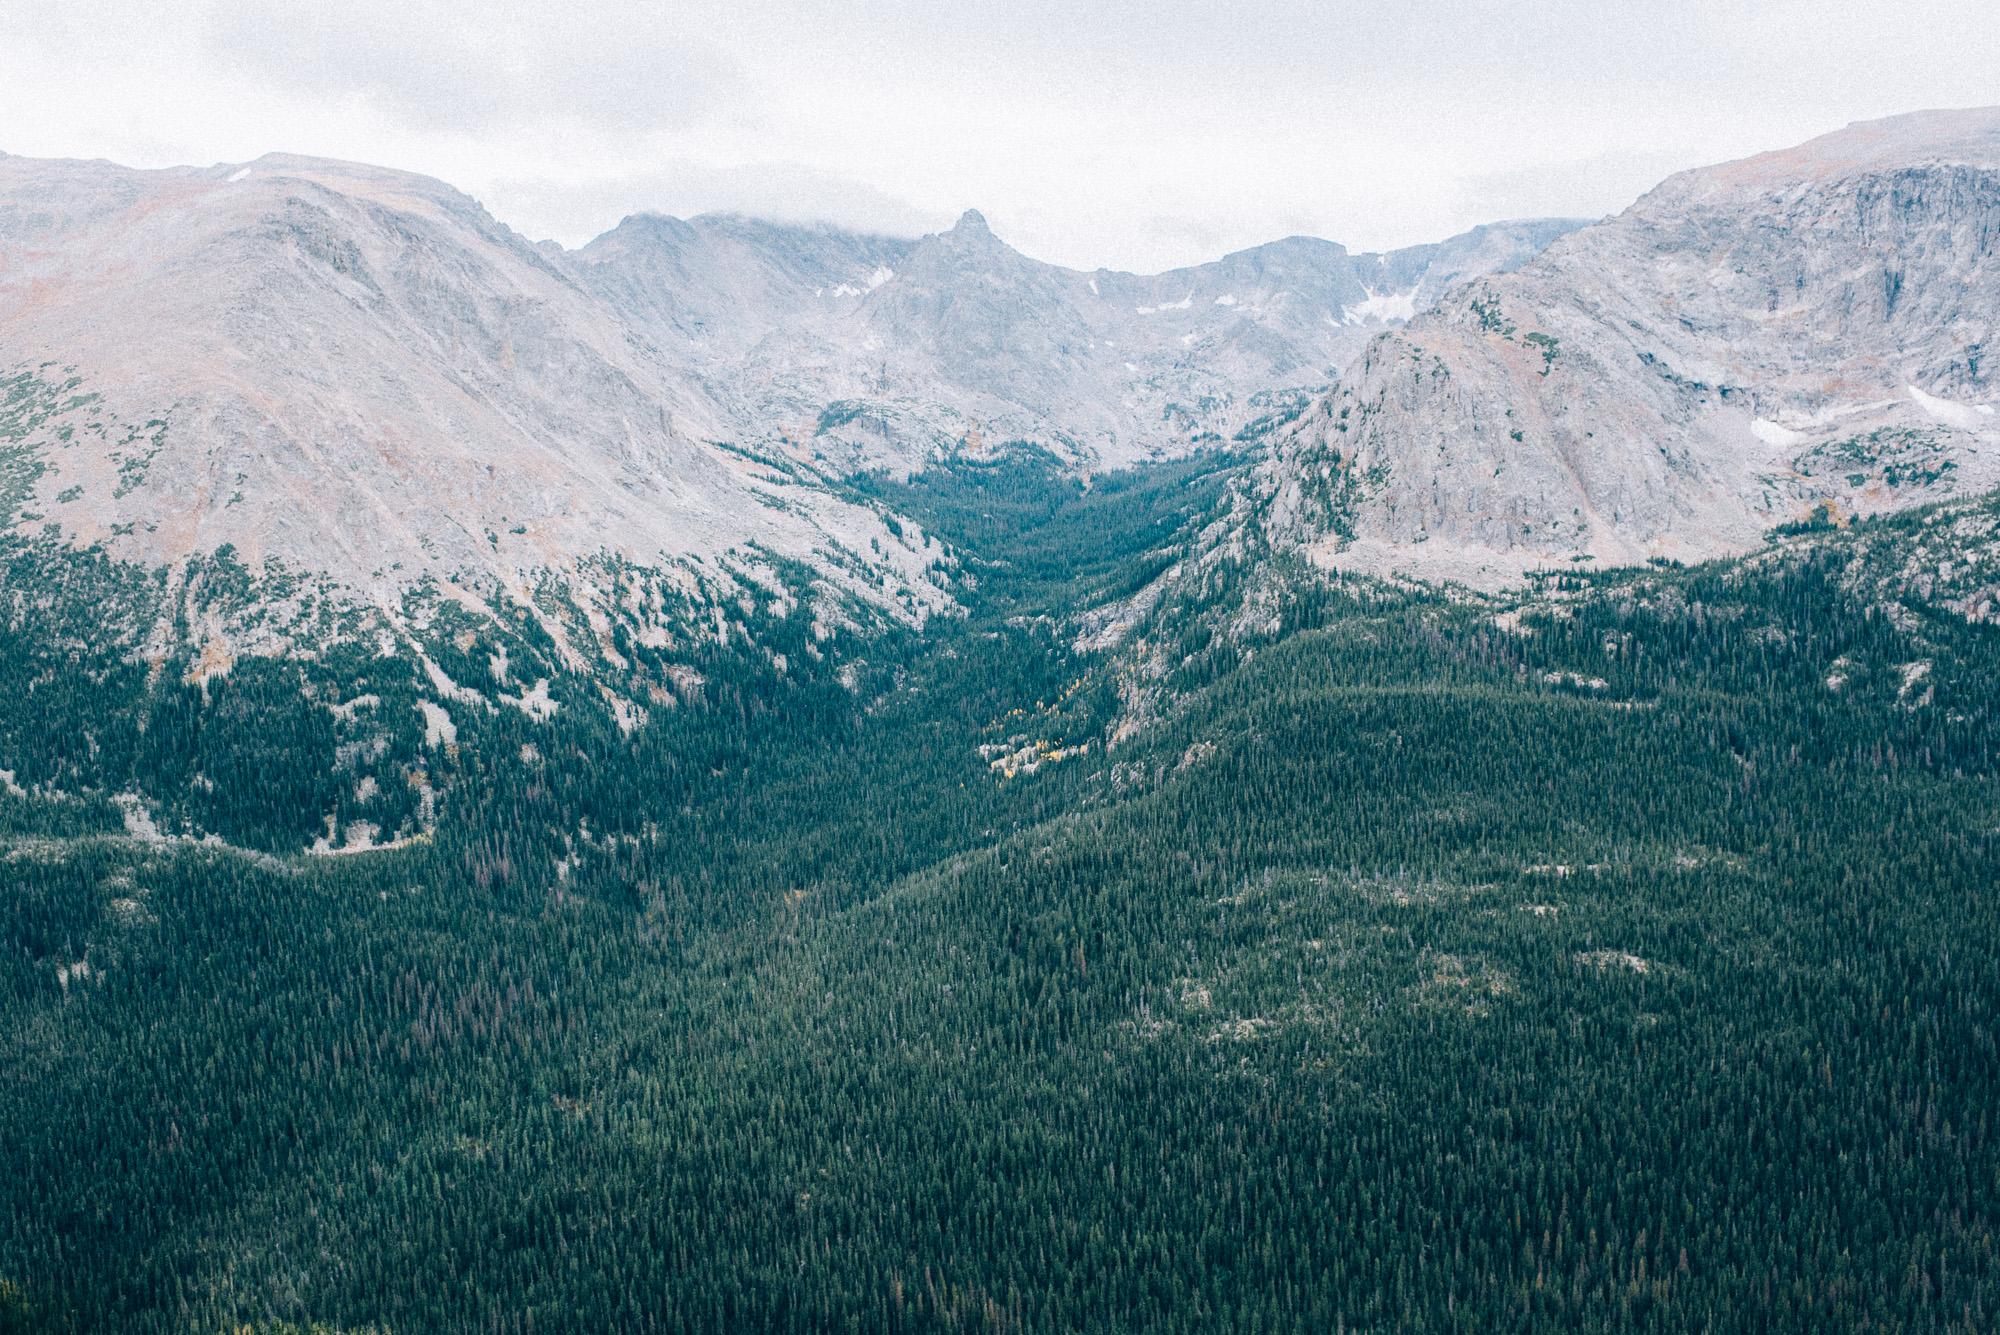 Rocky Mountain Colorado Engagement & Wedding Photographer